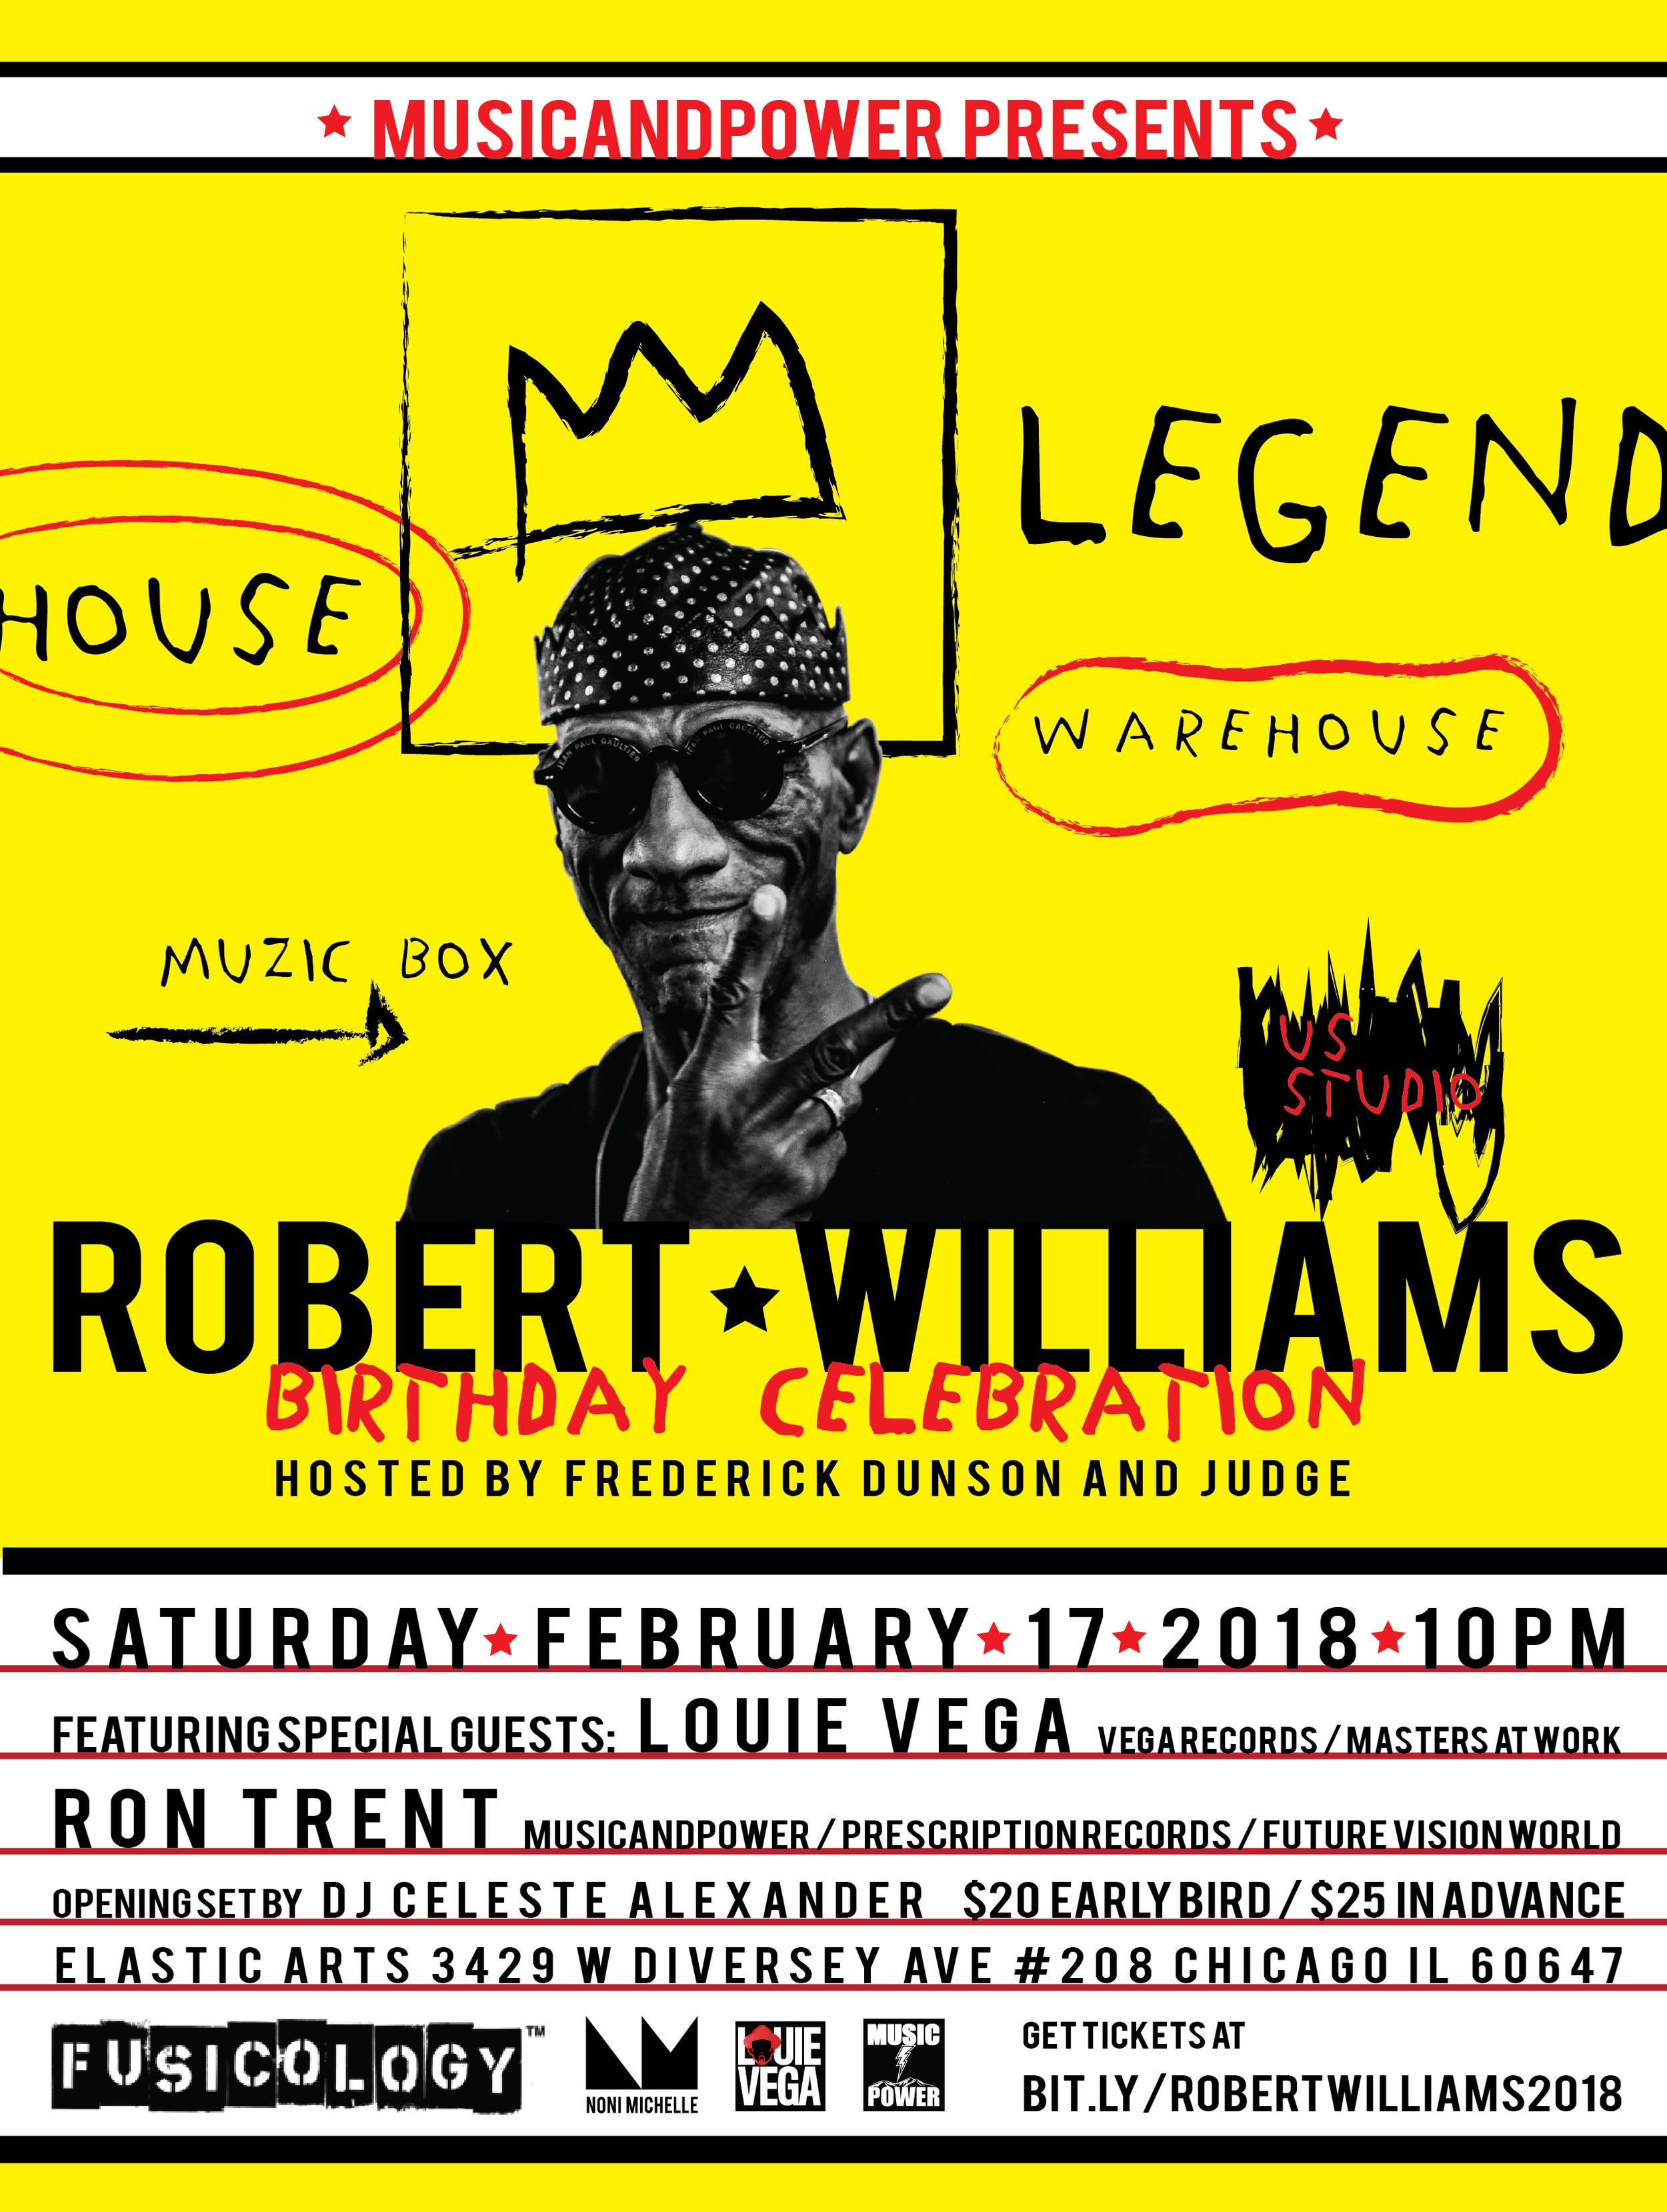 Robert Williams Birthday Celebration 2018 Featuring Louie Vega and Ron Trent Elastic Arts Flyer